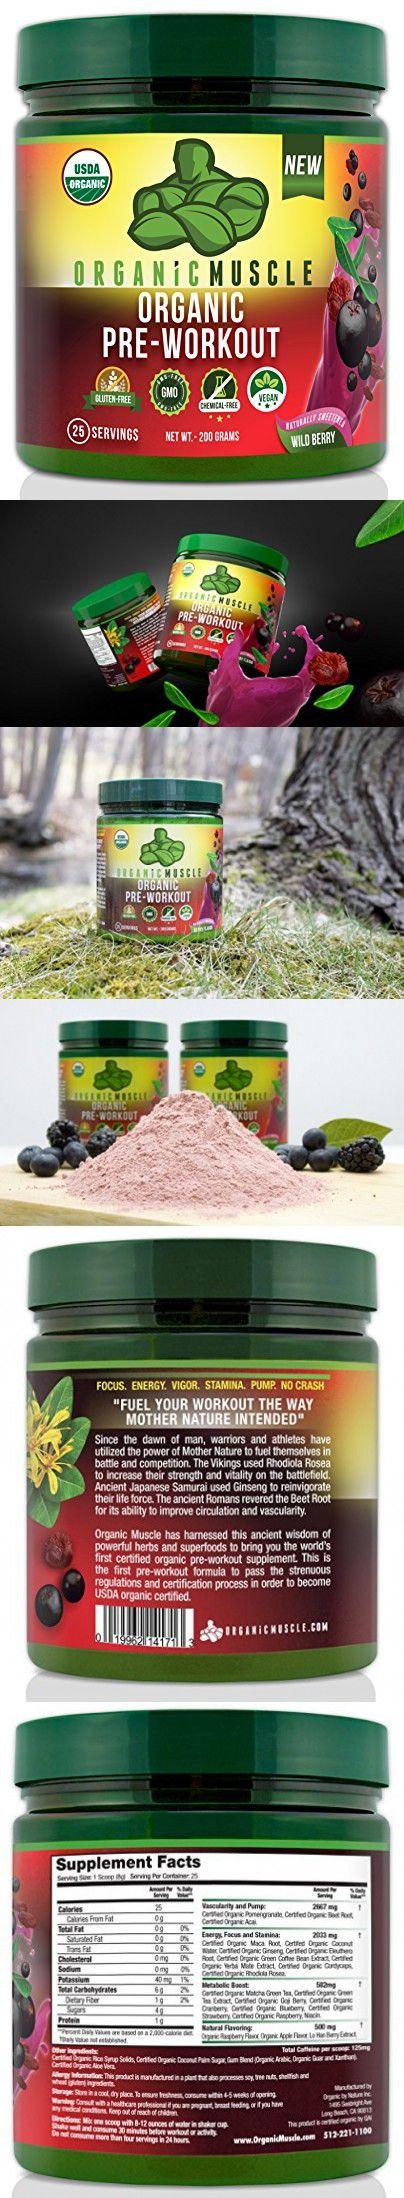 USDA Certified Organic Pre-Workout Supplement - Natural Pre Workout & Organic Energy Drink- Vegan, Paleo, Gluten Free, Non-GMO -- Wild Berry Flavor, 20 serv.